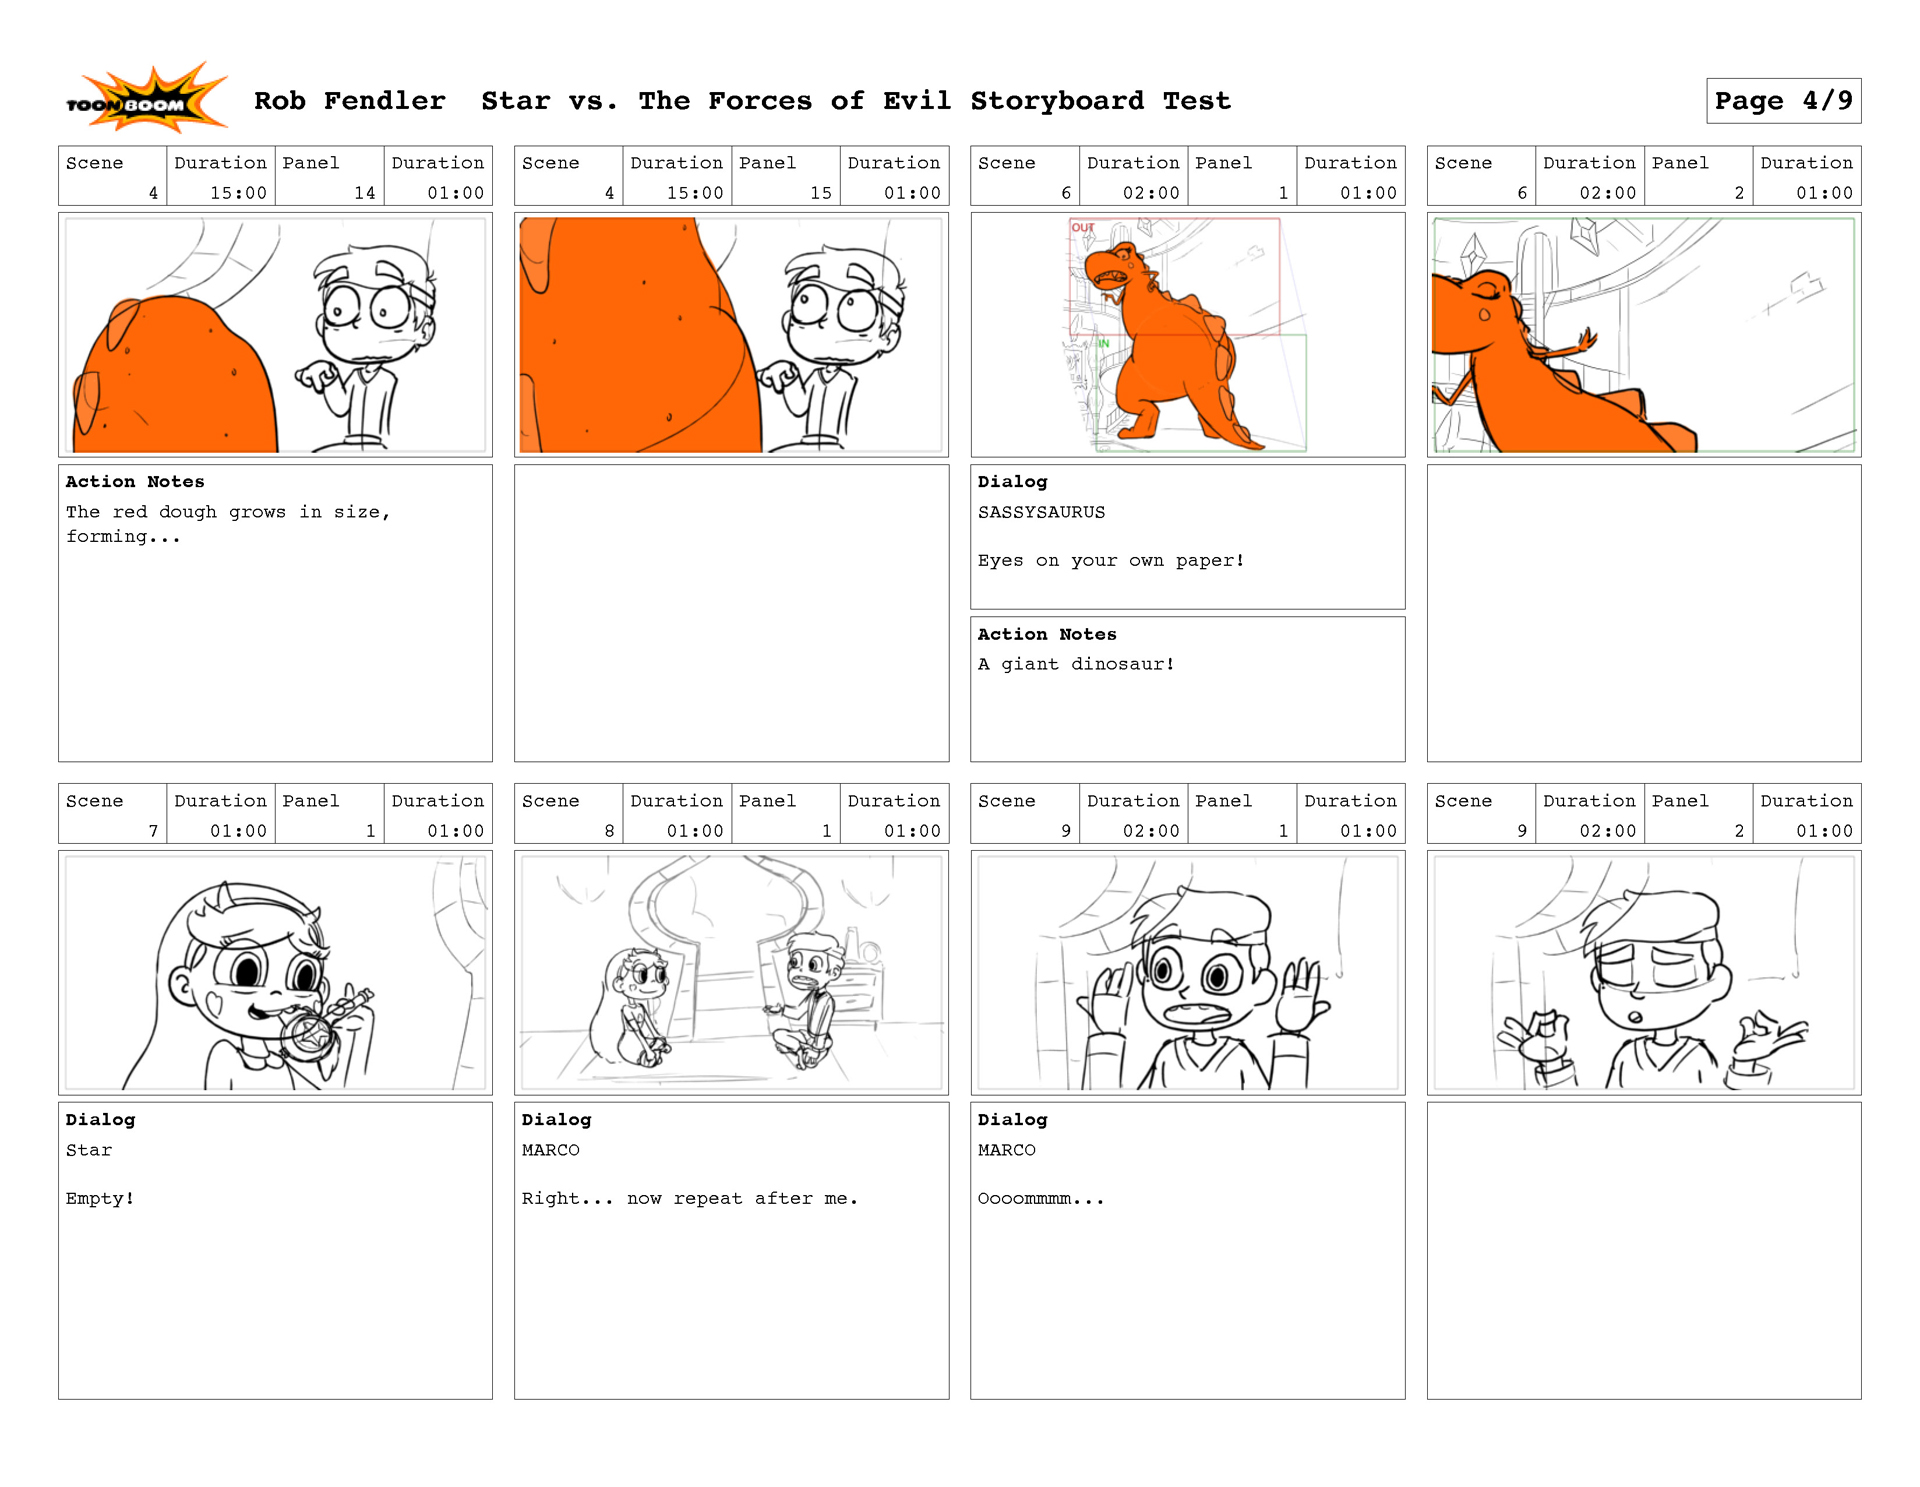 StarVs_Storyboardtest_Page_4_1920